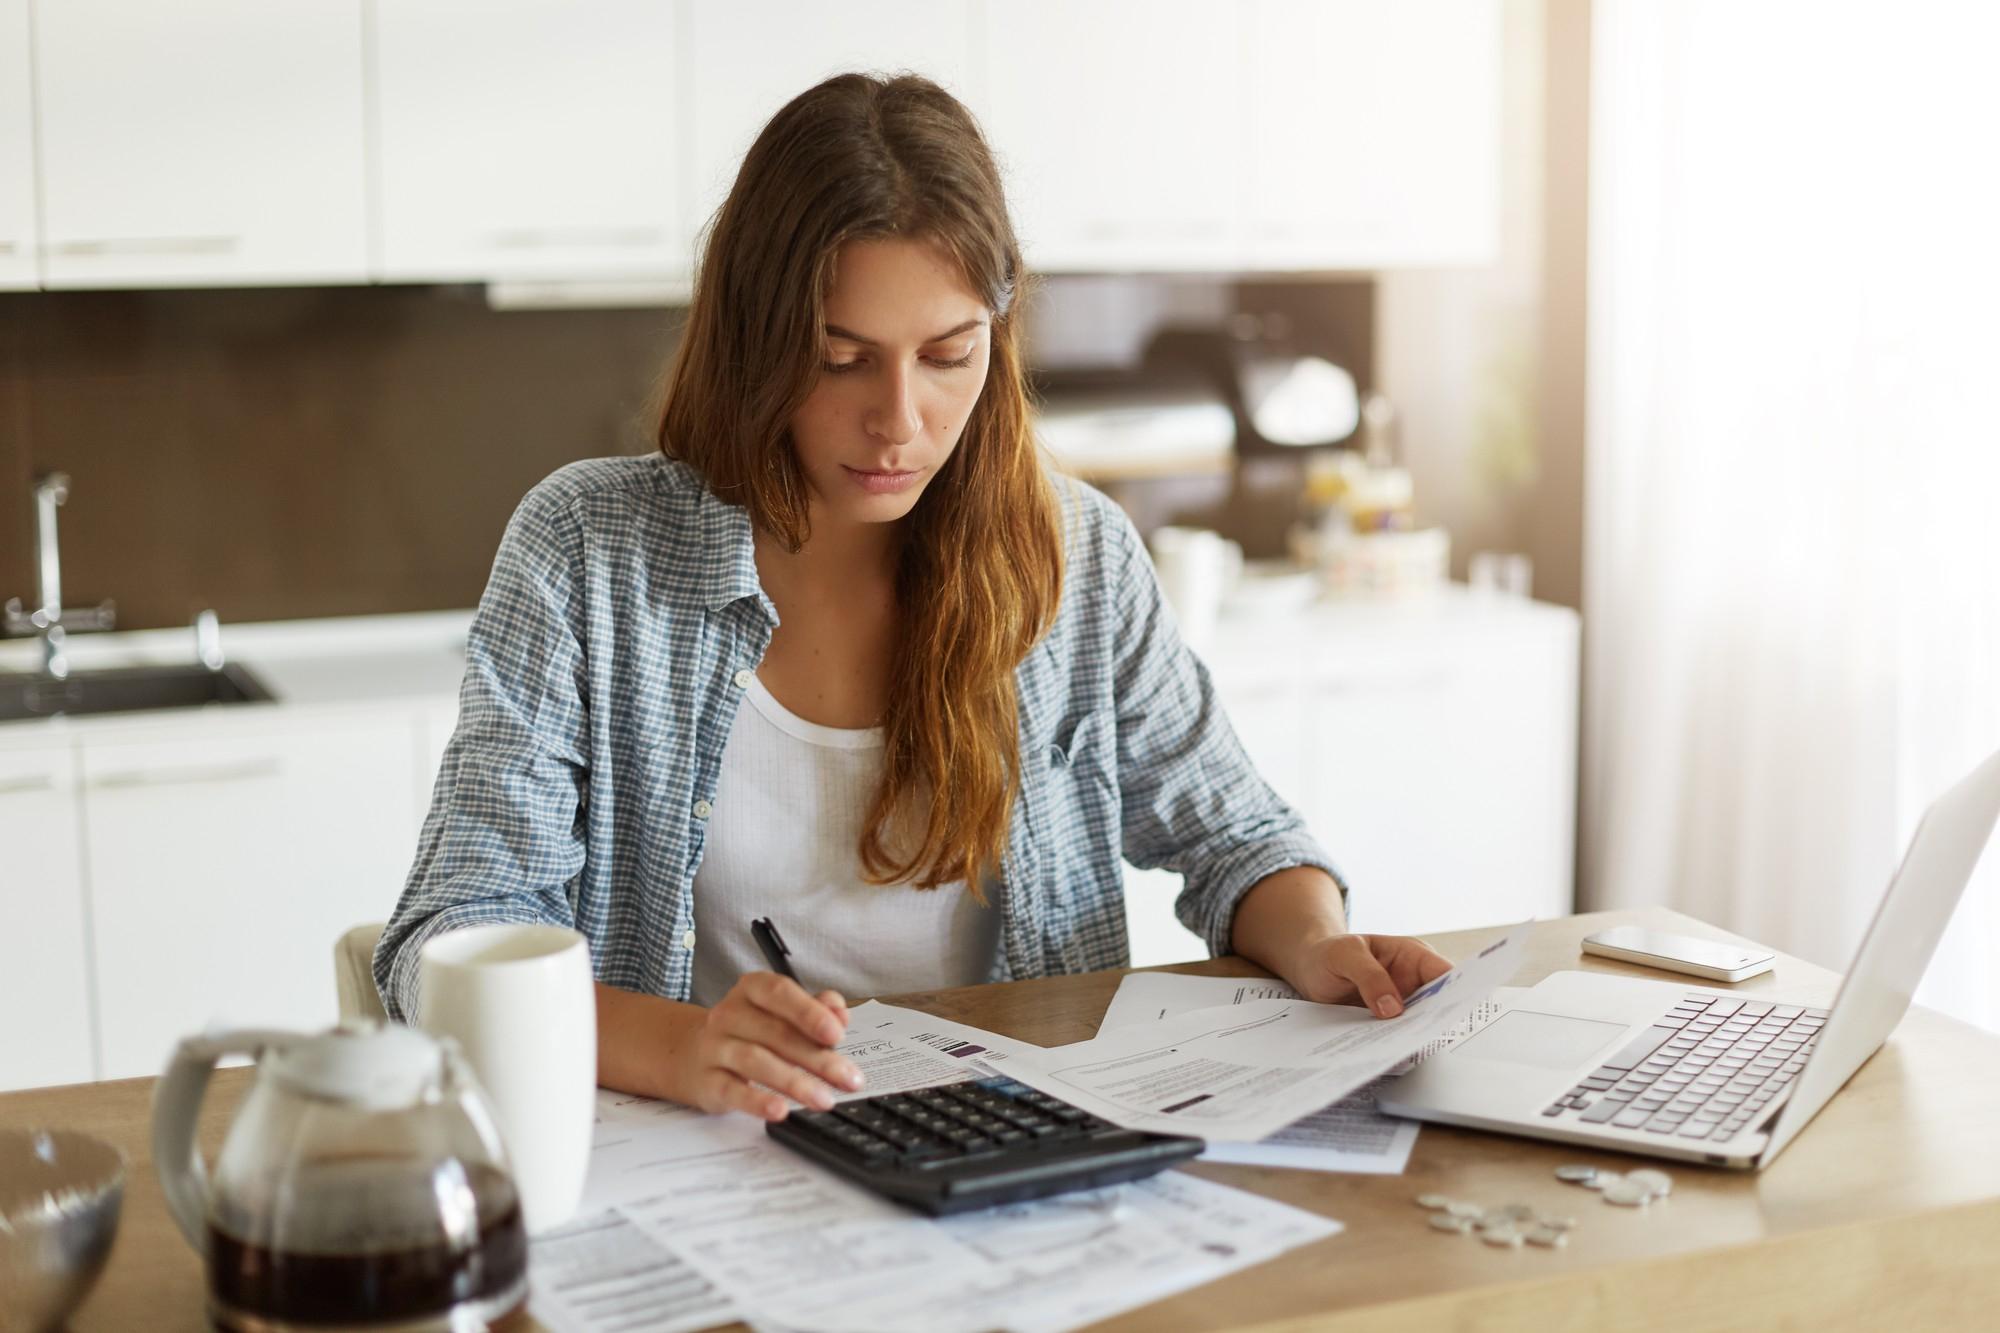 Сделка купли-продажи недвижимого имущества